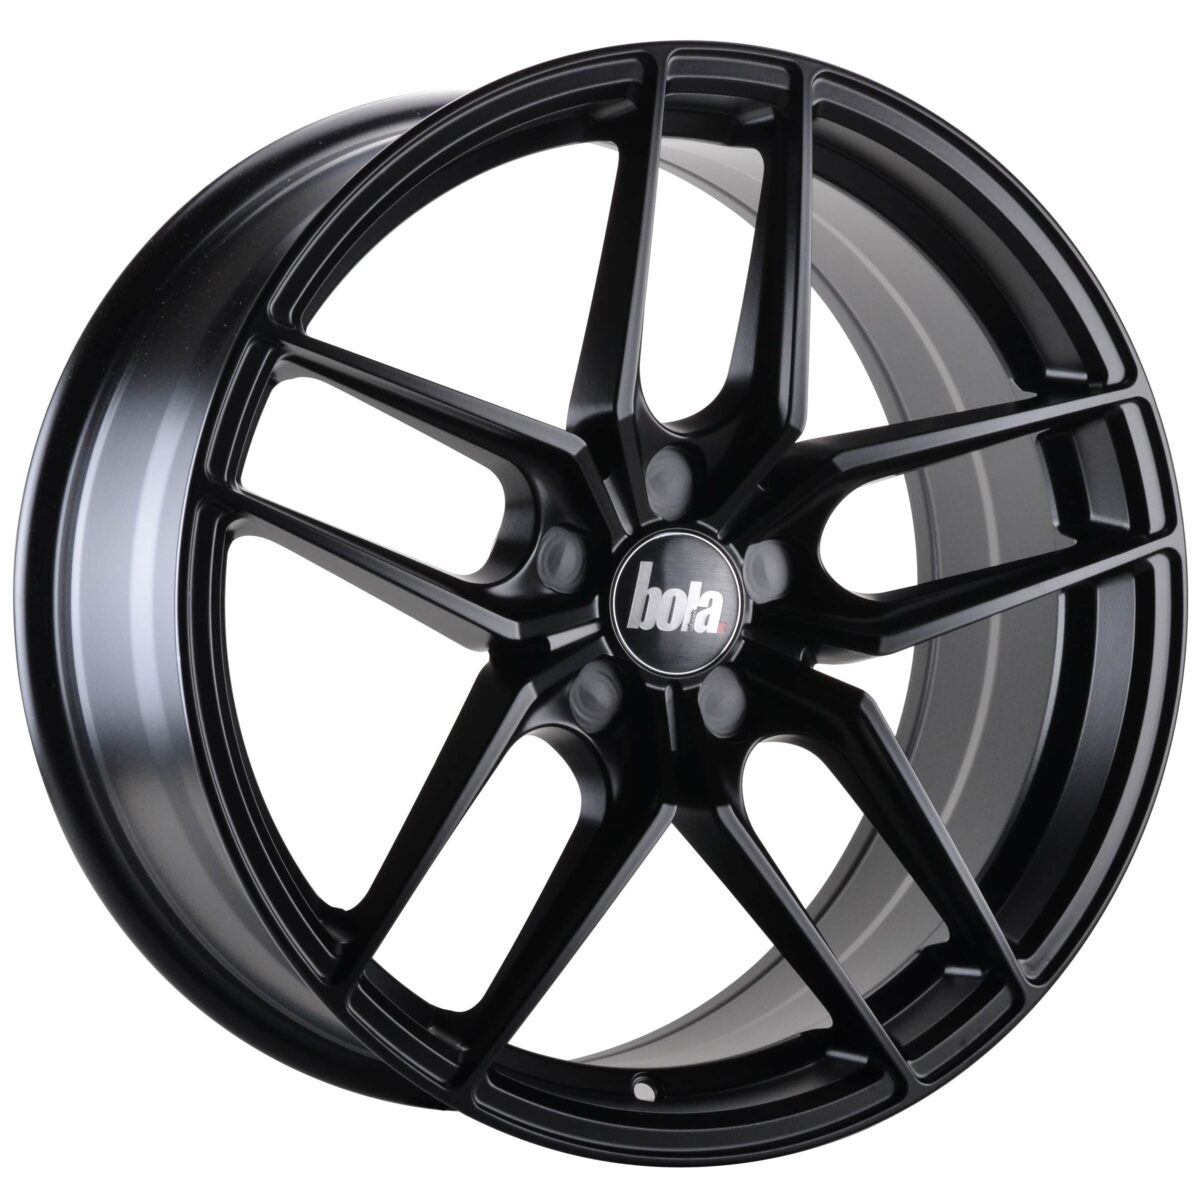 "19"" BOLA B11 Wheels - Matt Black - VW / Audi / Mercedes - 5x112"